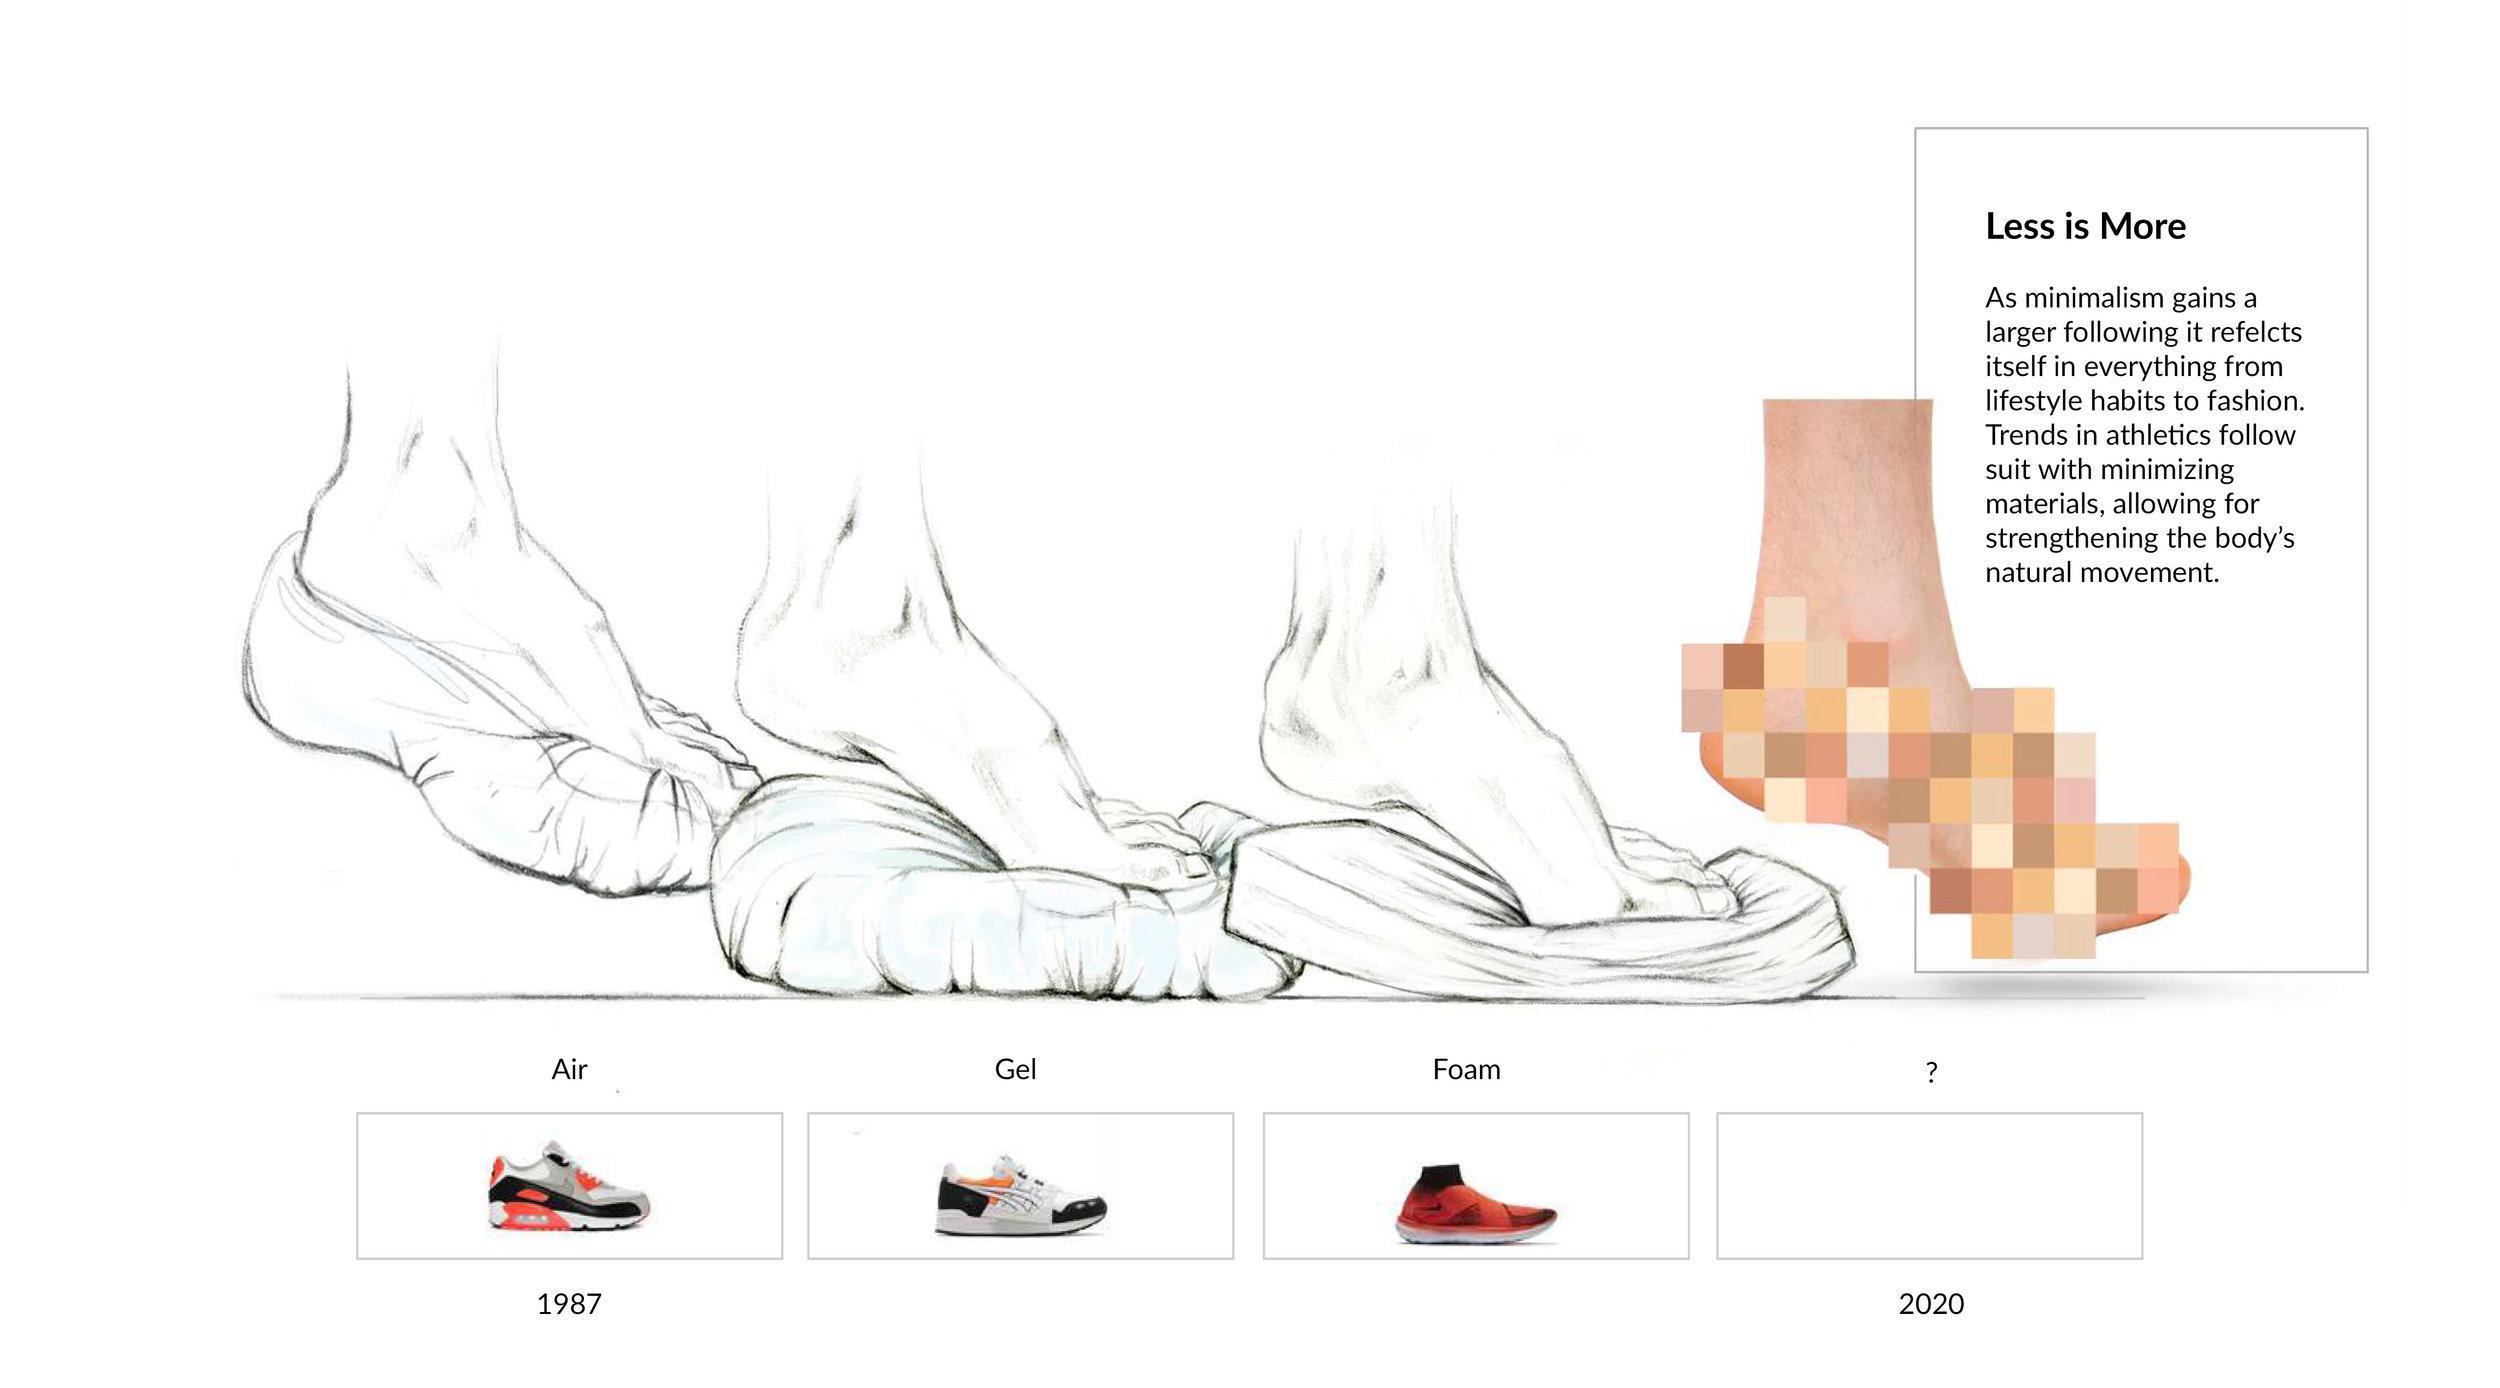 Barefoot_Minimalism.jpg